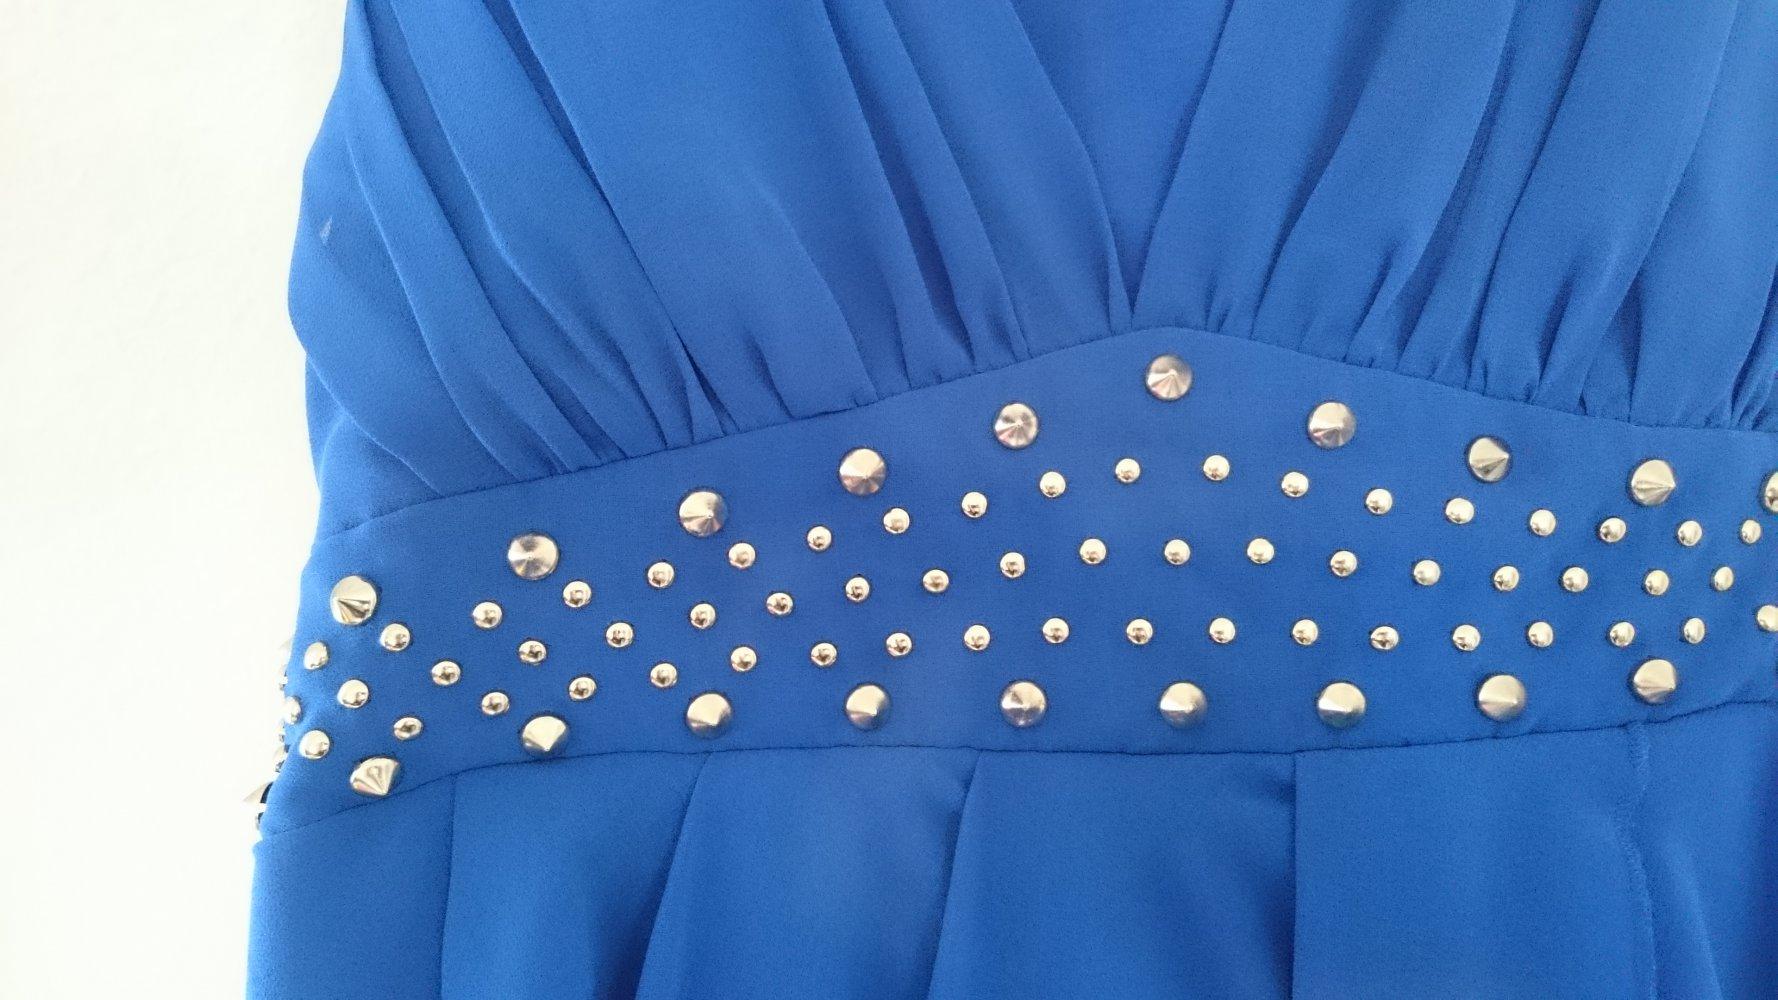 zauberhaftes kleid von vila in fließender optik